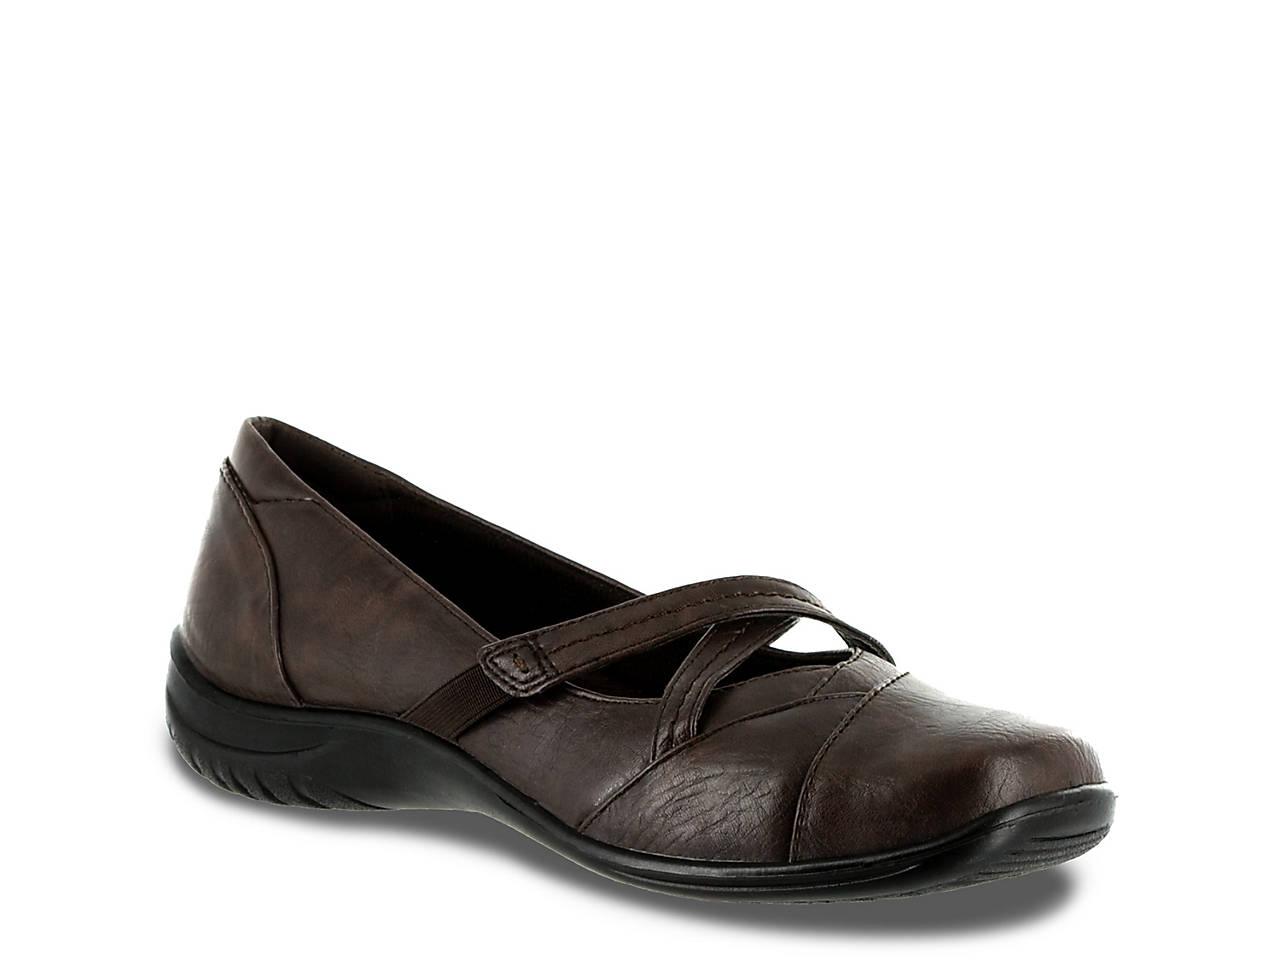 Easy Street Marcie Women's ... Slip-On Casual Shoes xSi2ugzra